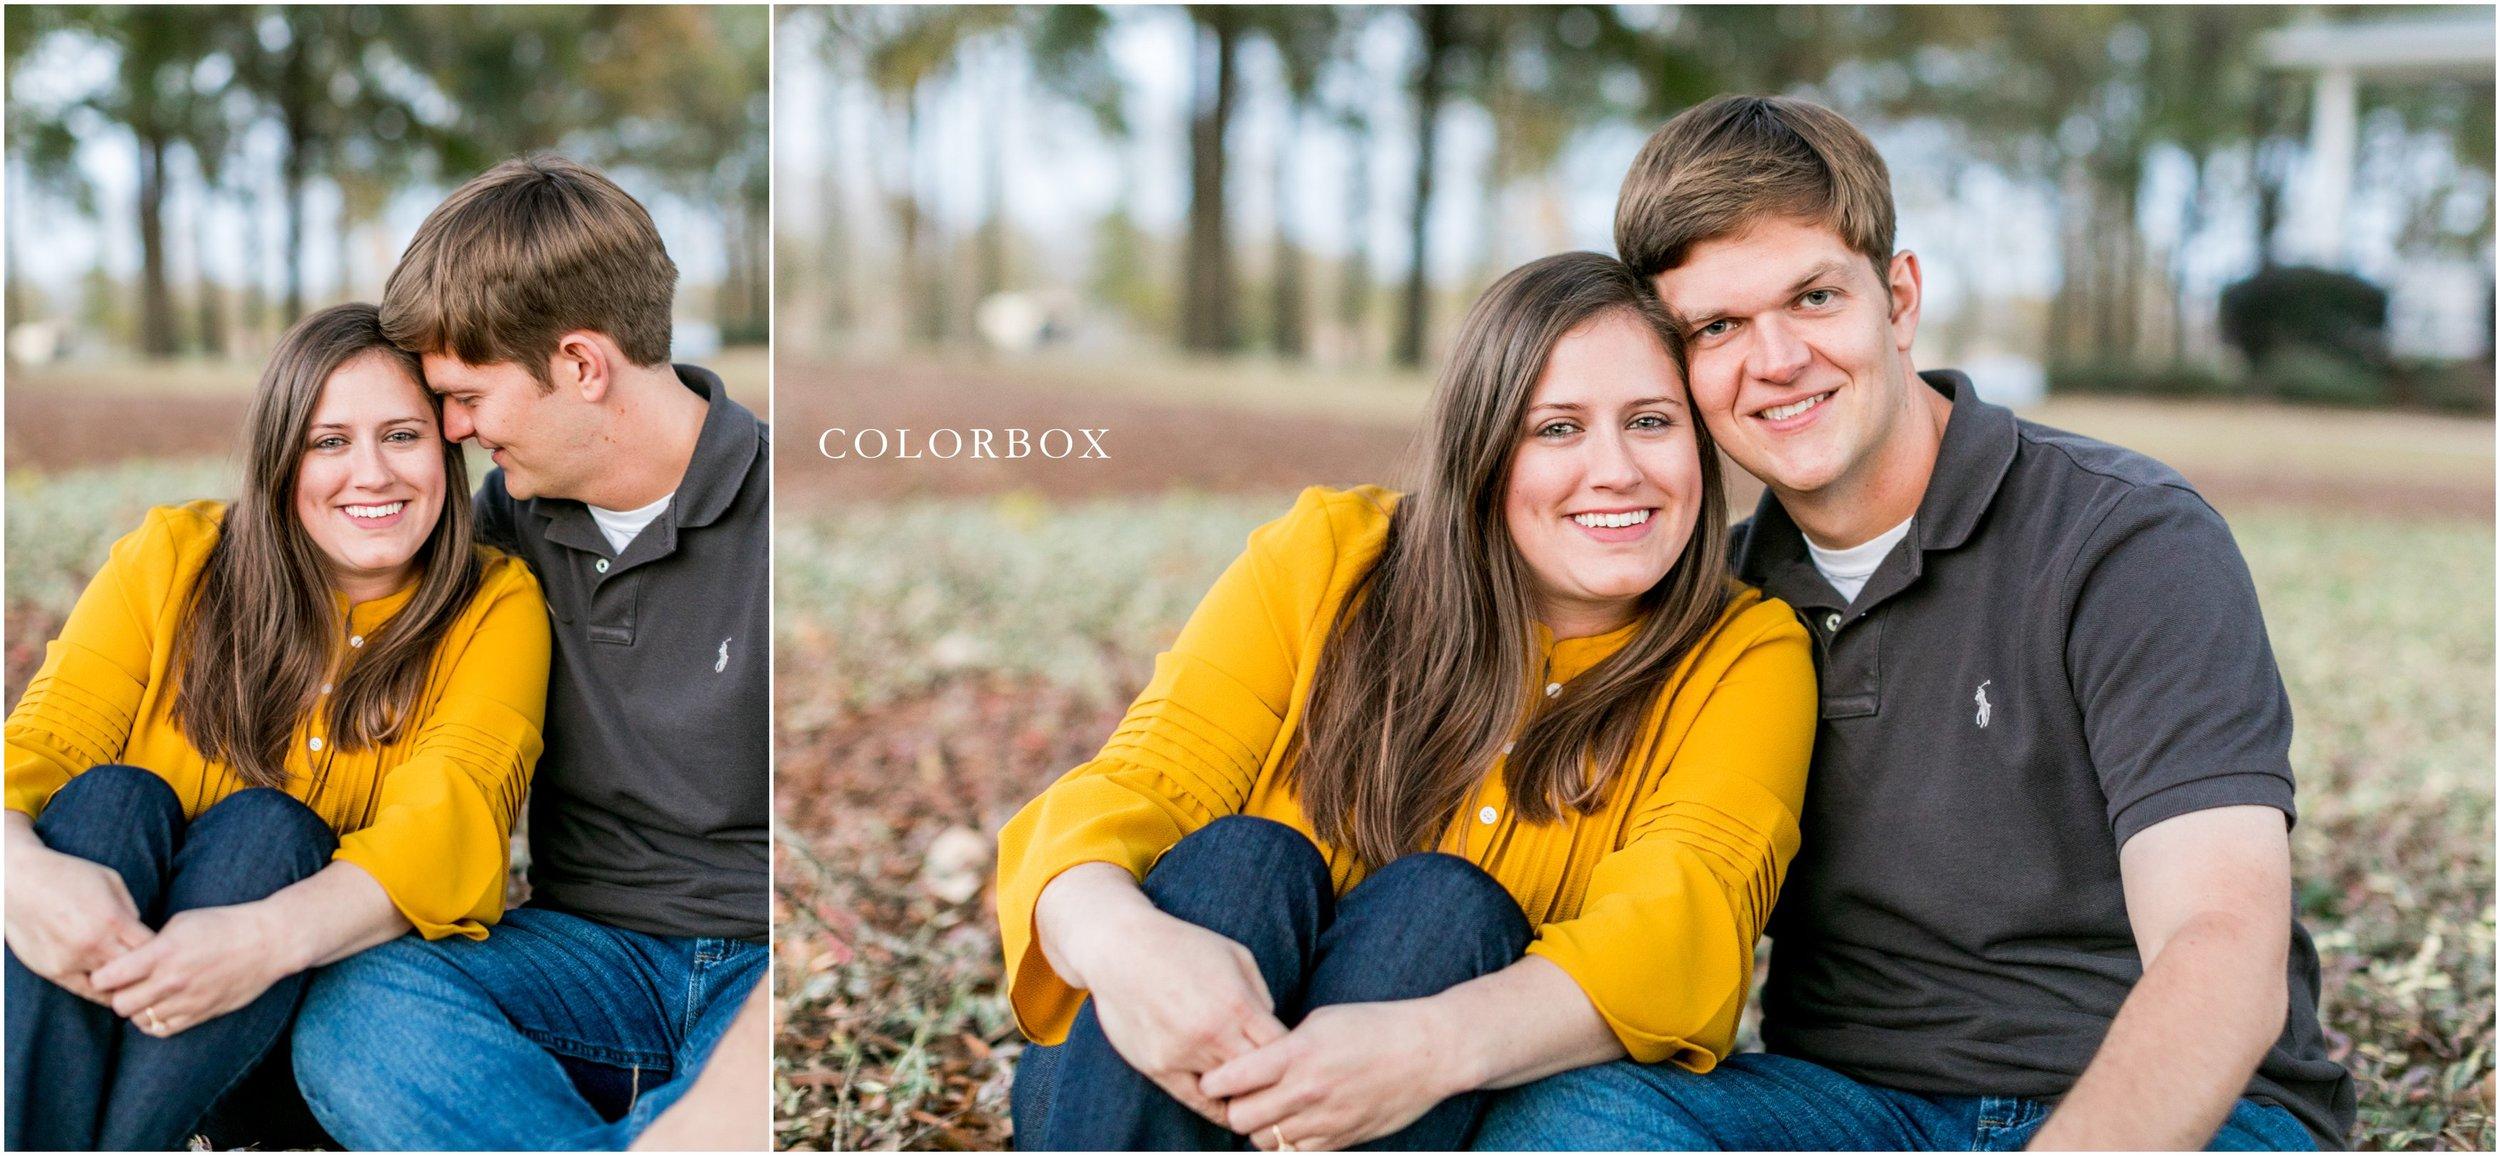 colorboxphotographers_6413.jpg